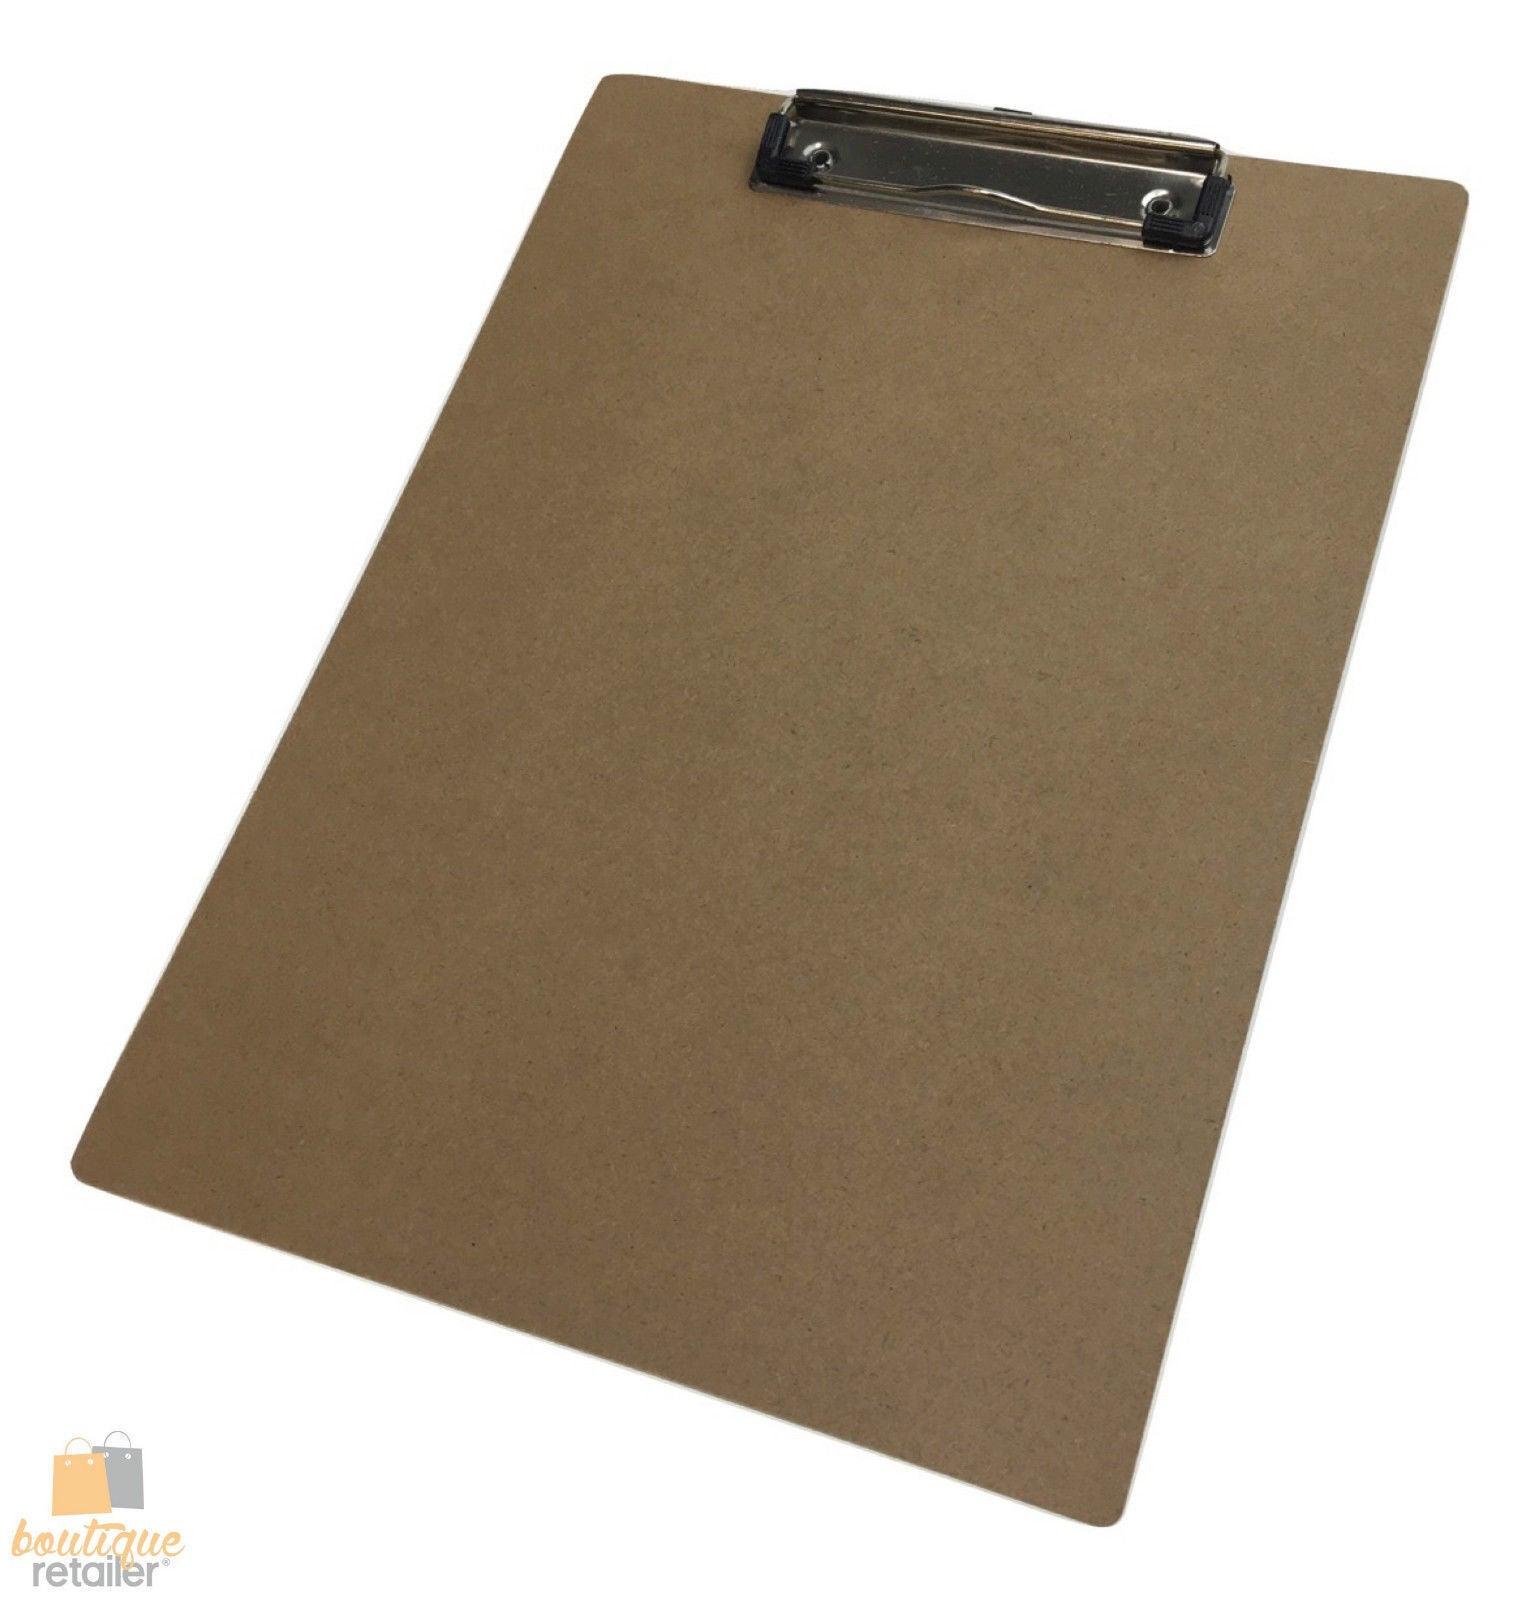 12x WOODEN A4 CLIPBOARD Hardboard Menu Clip Office Restaurant Writing Board BULK